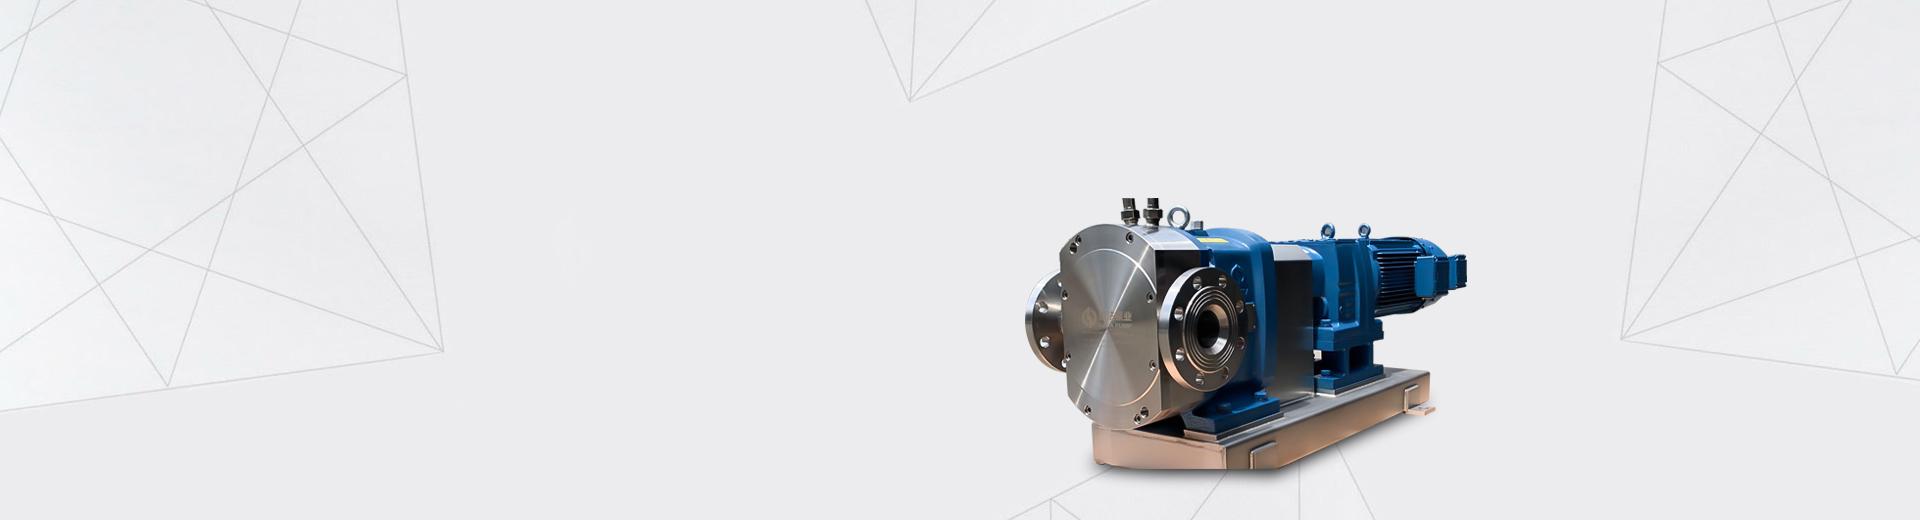 Rotor pump manufacturer